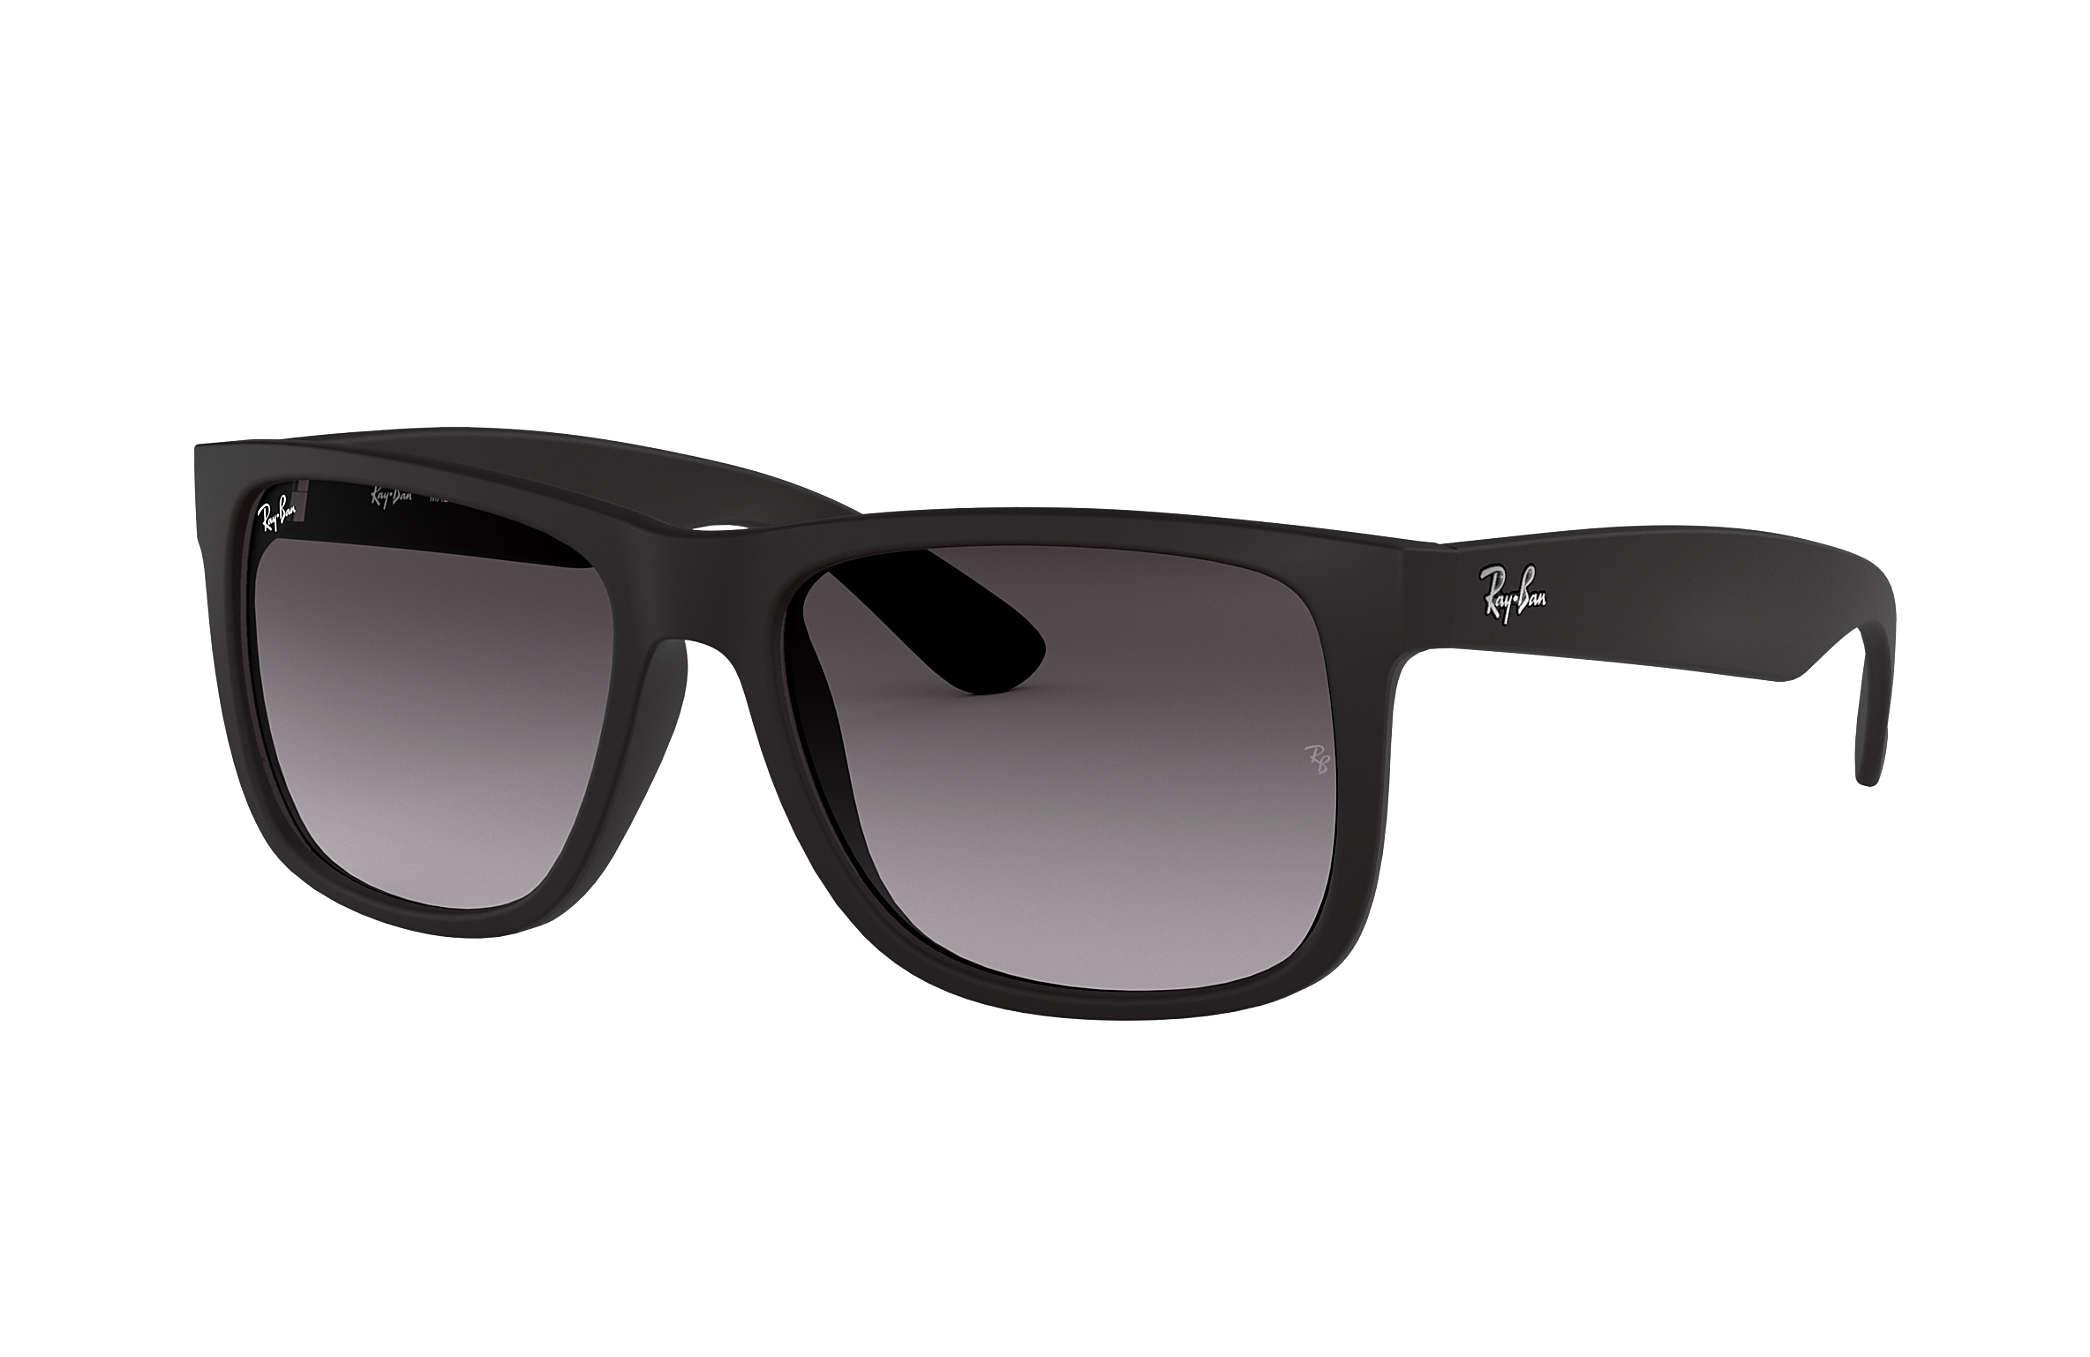 b71cc44ded3a6 Óculos de sol Justin  a coleção   Ray-Ban® Brasil